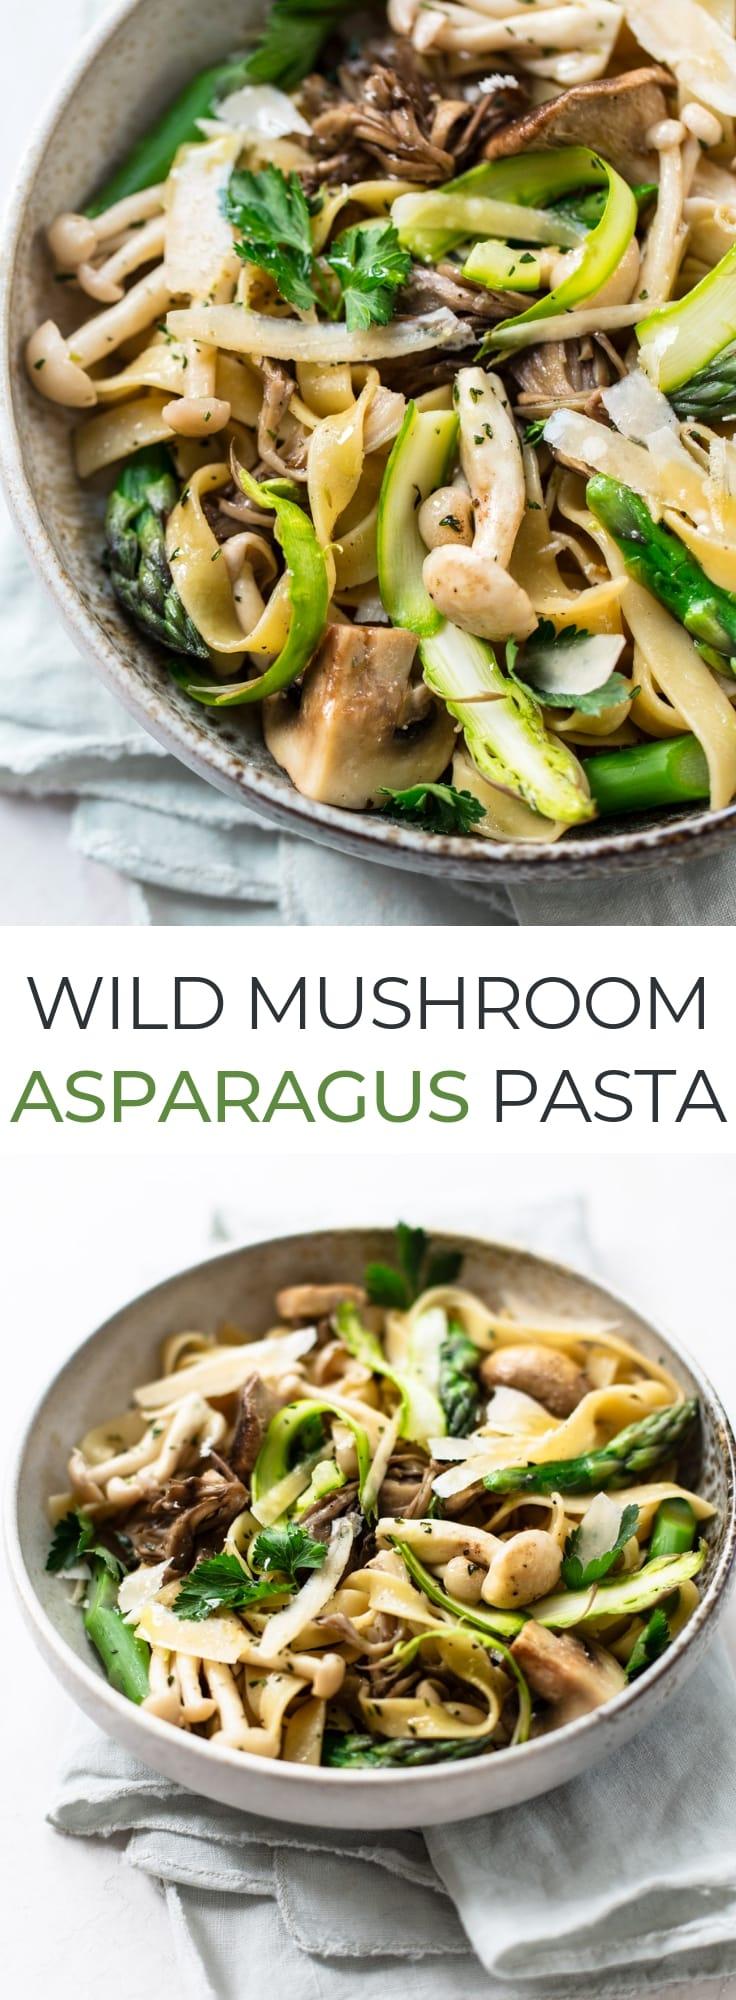 Wild Mushroom and Asparagus Pasta